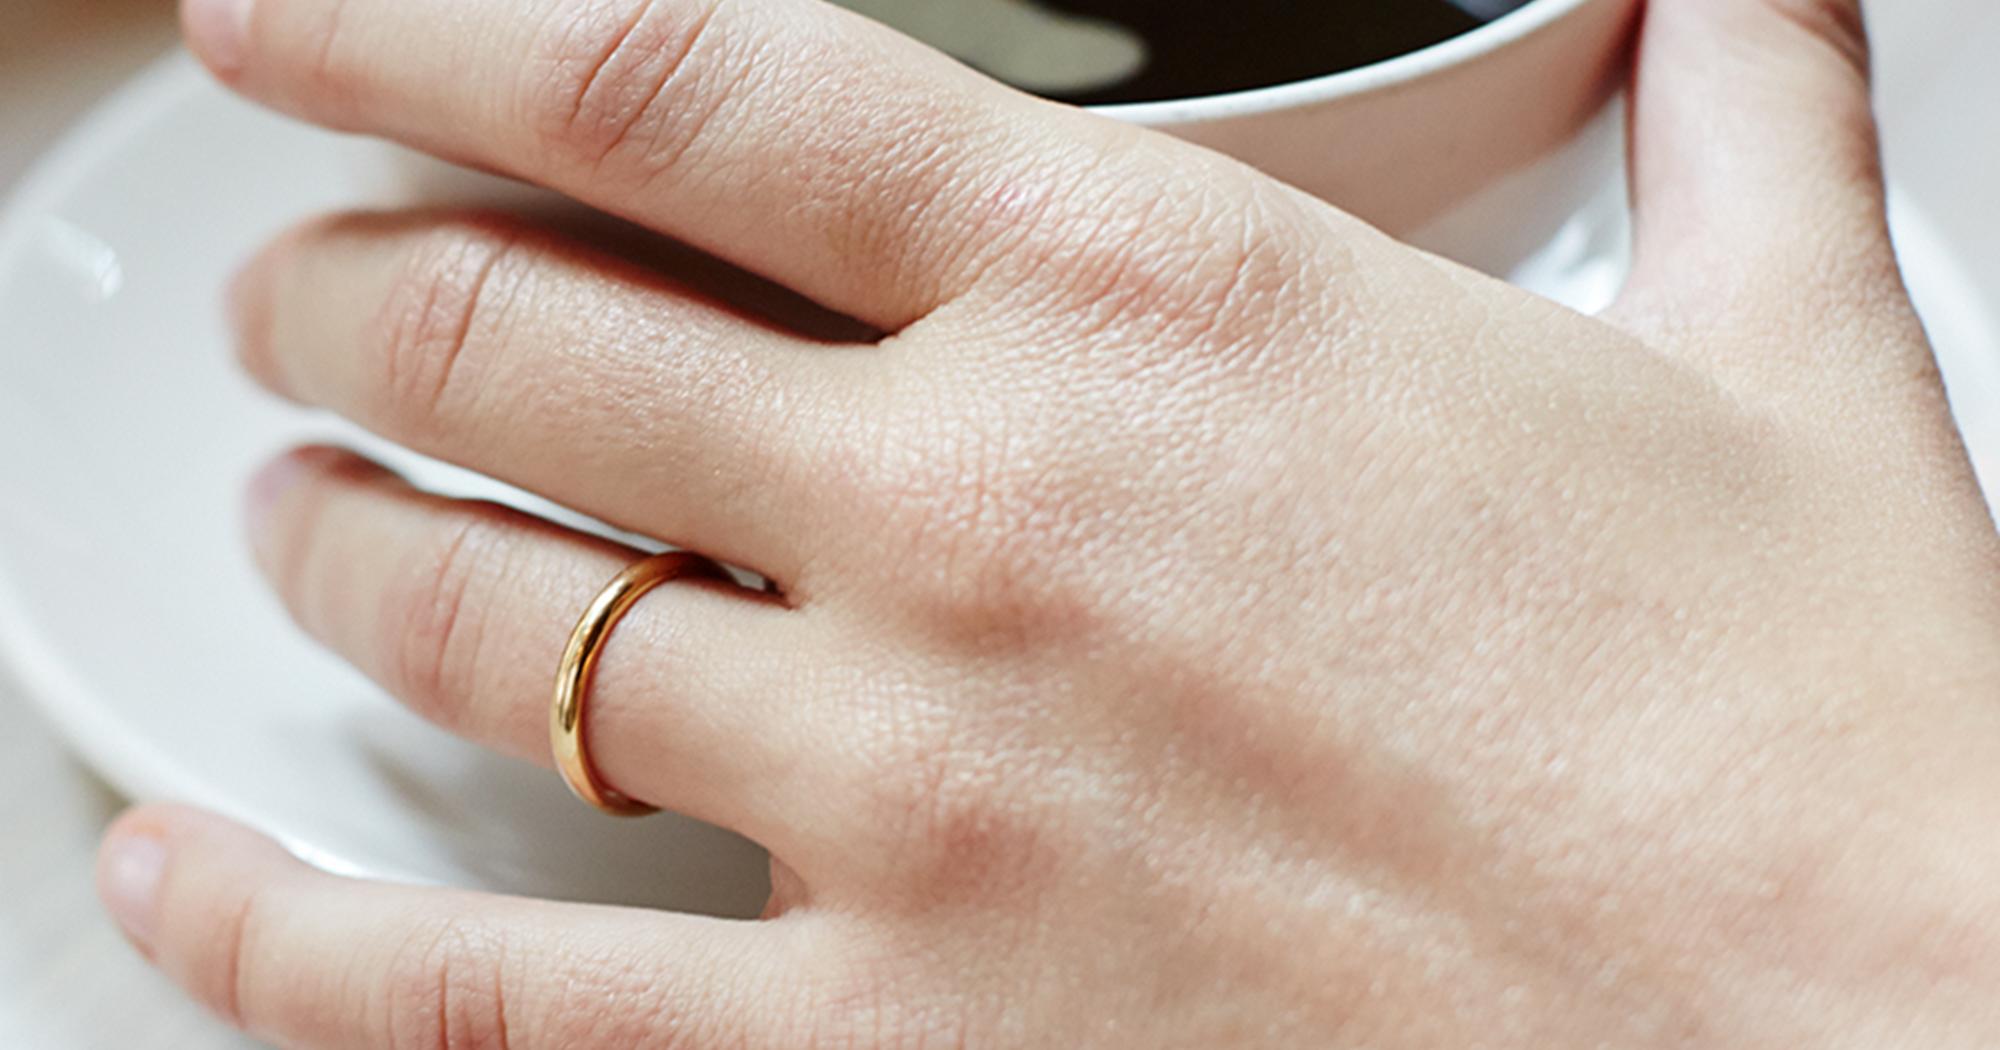 Ringfinger bedeutung linker spirituelle Ring